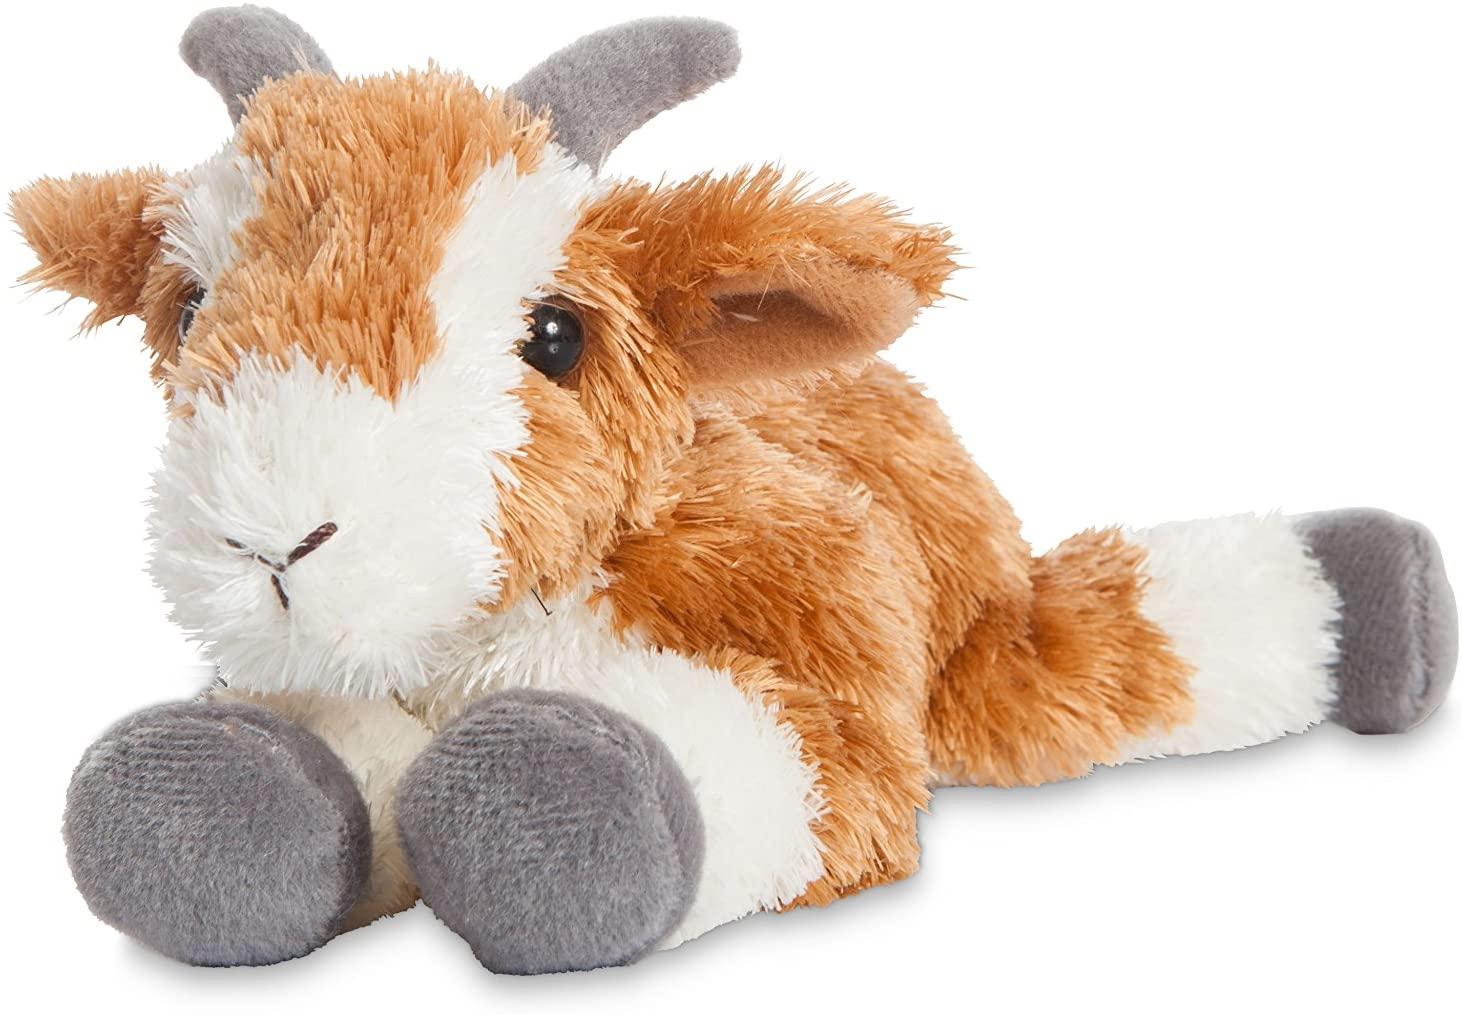 Aurora, 73903, Mini Flopsies Pickles, 8In, Fluffy Goat Cuddly Toy, Multicolour, White, Orange and Grey